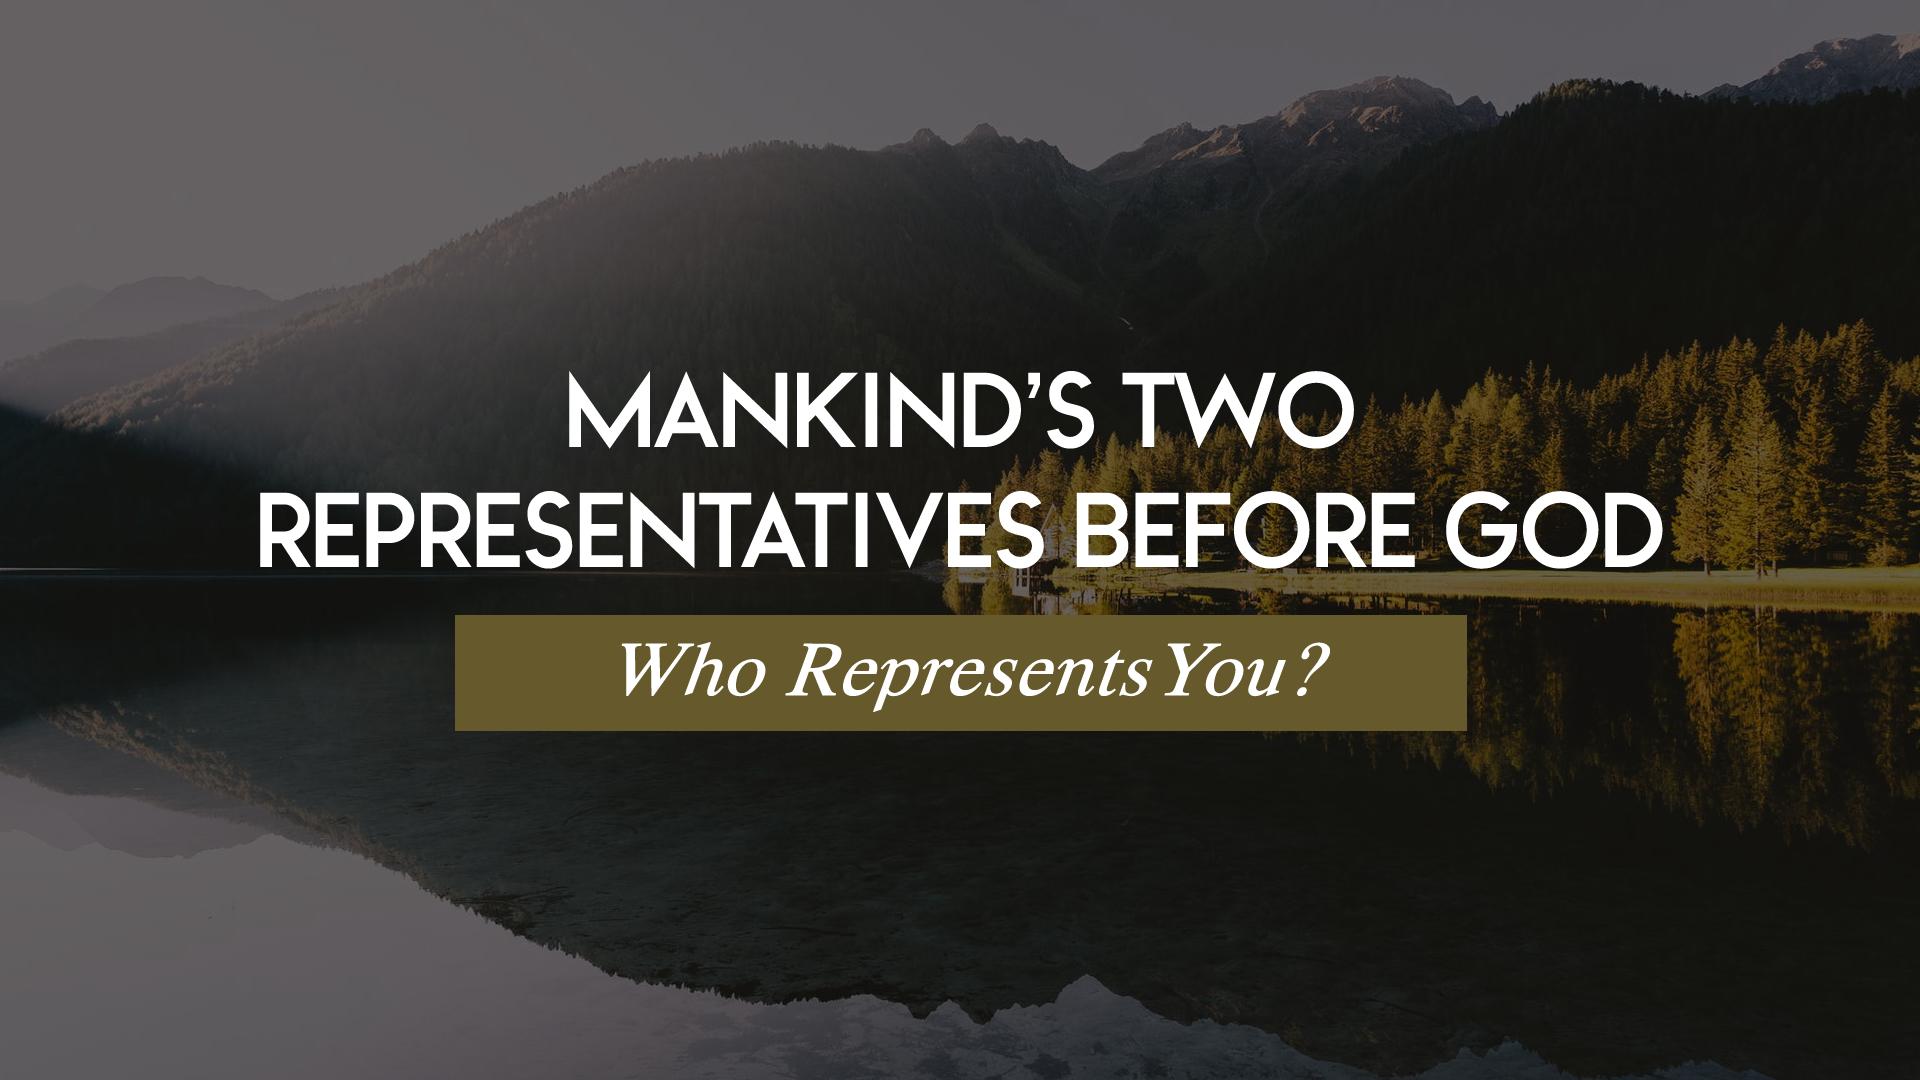 Mankinds Two Representatives Before God.jpg